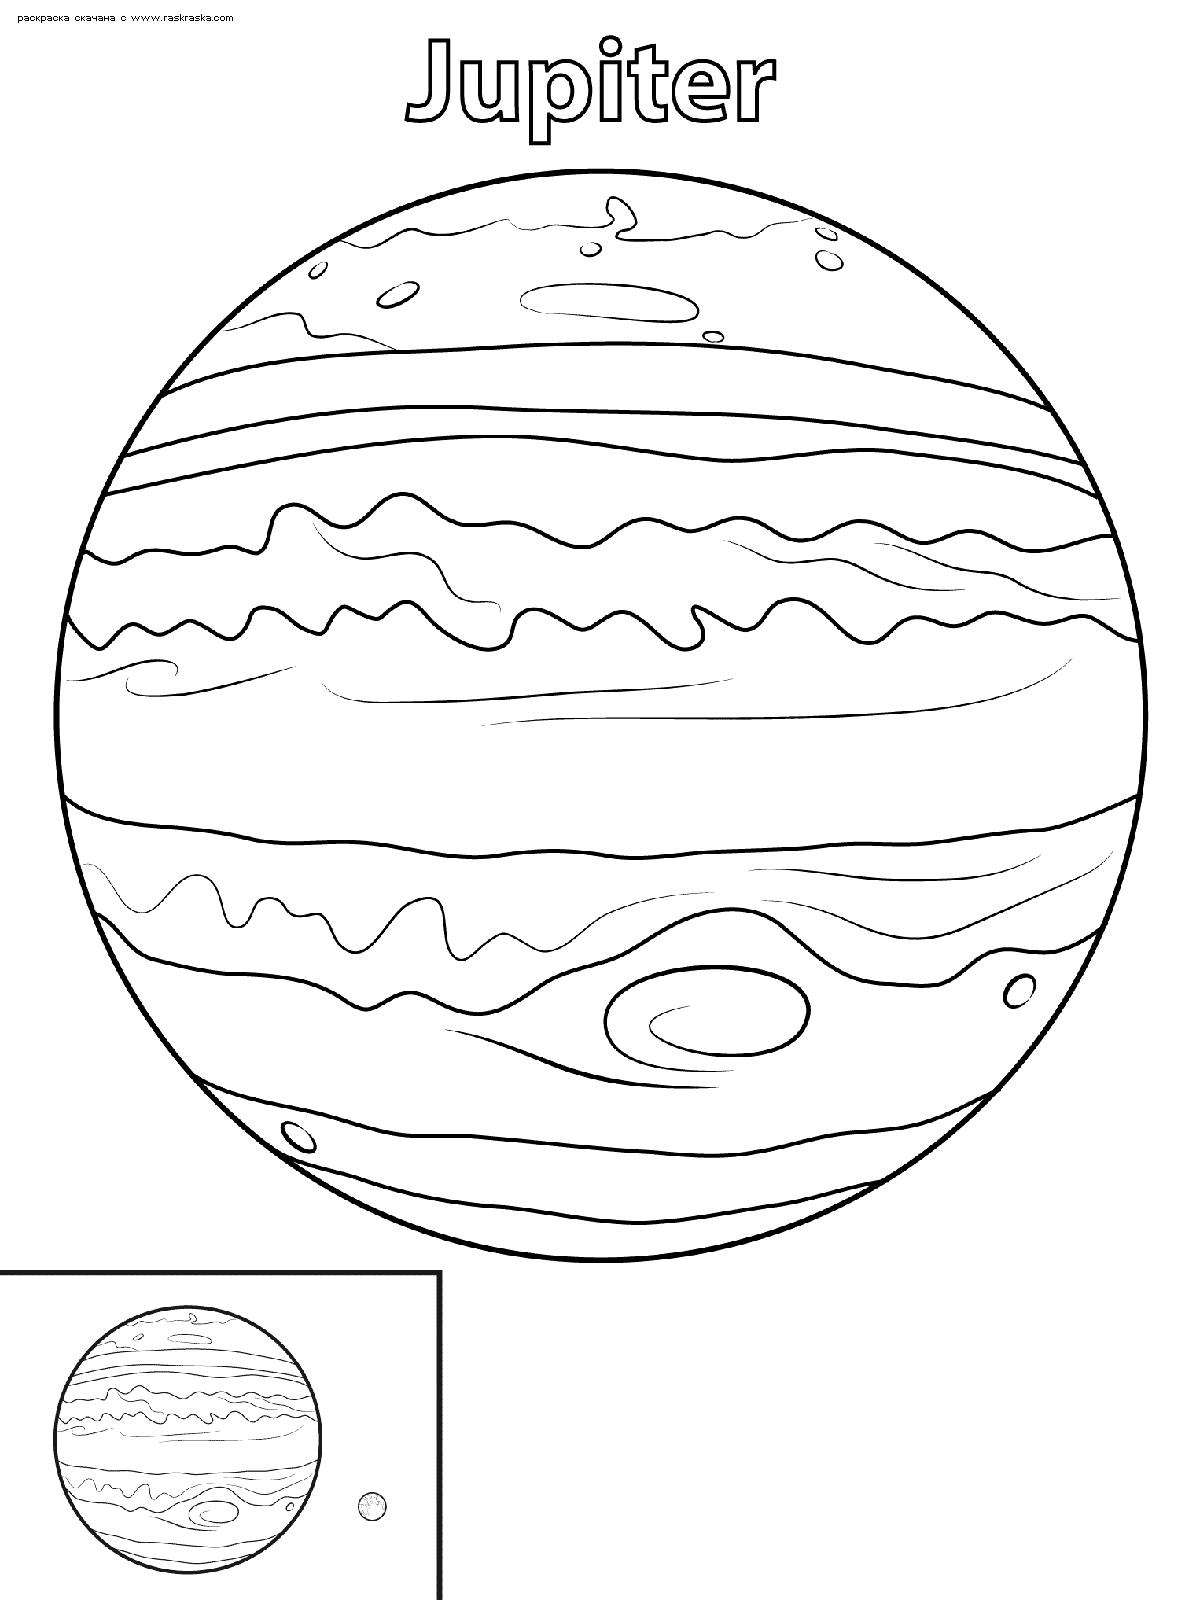 Раскраска Планета Юпитер. Раскраска юпитер